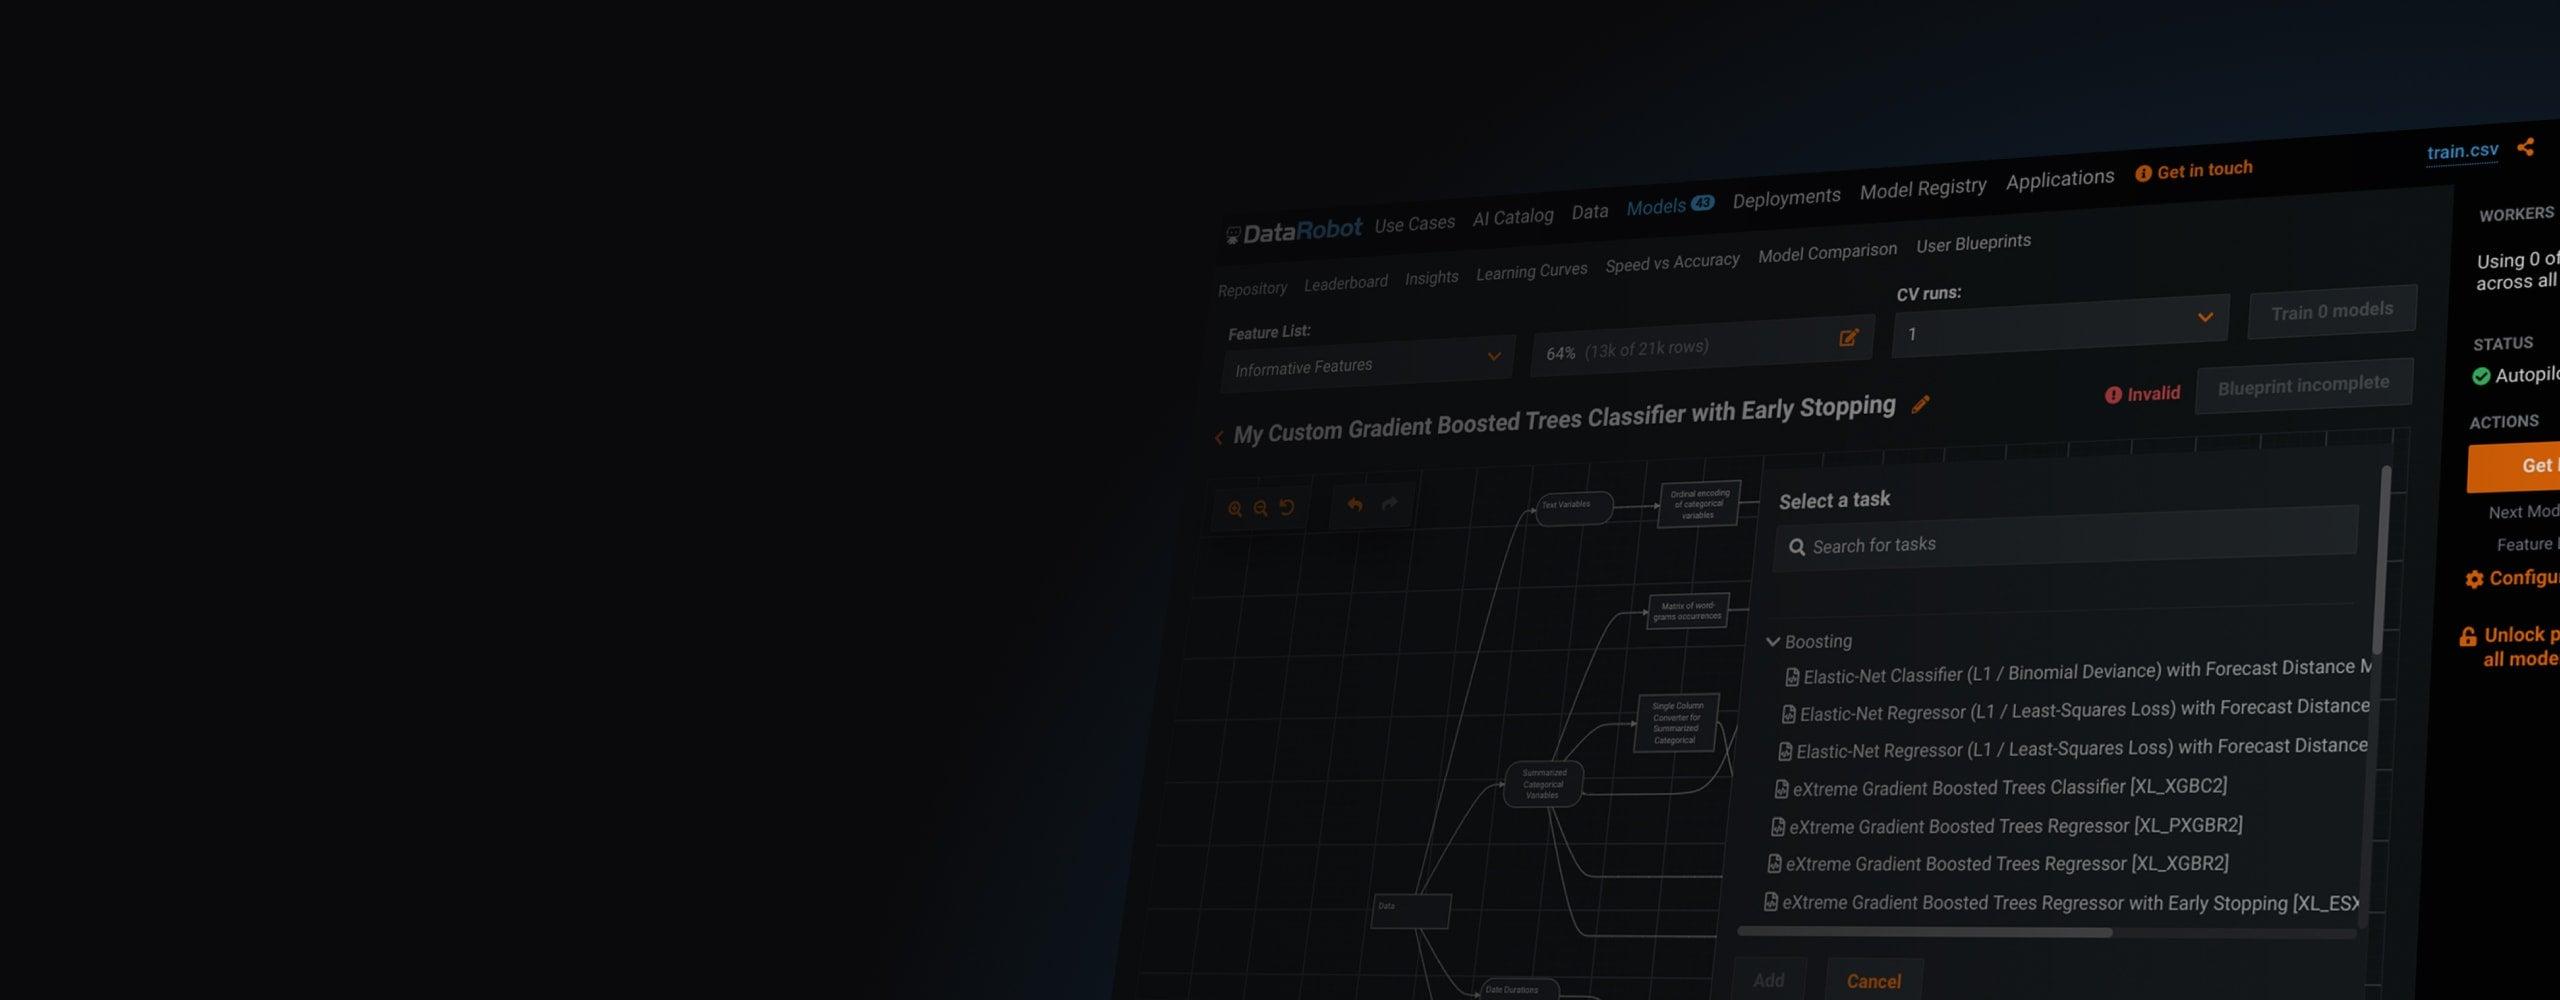 Composable ML hero banner